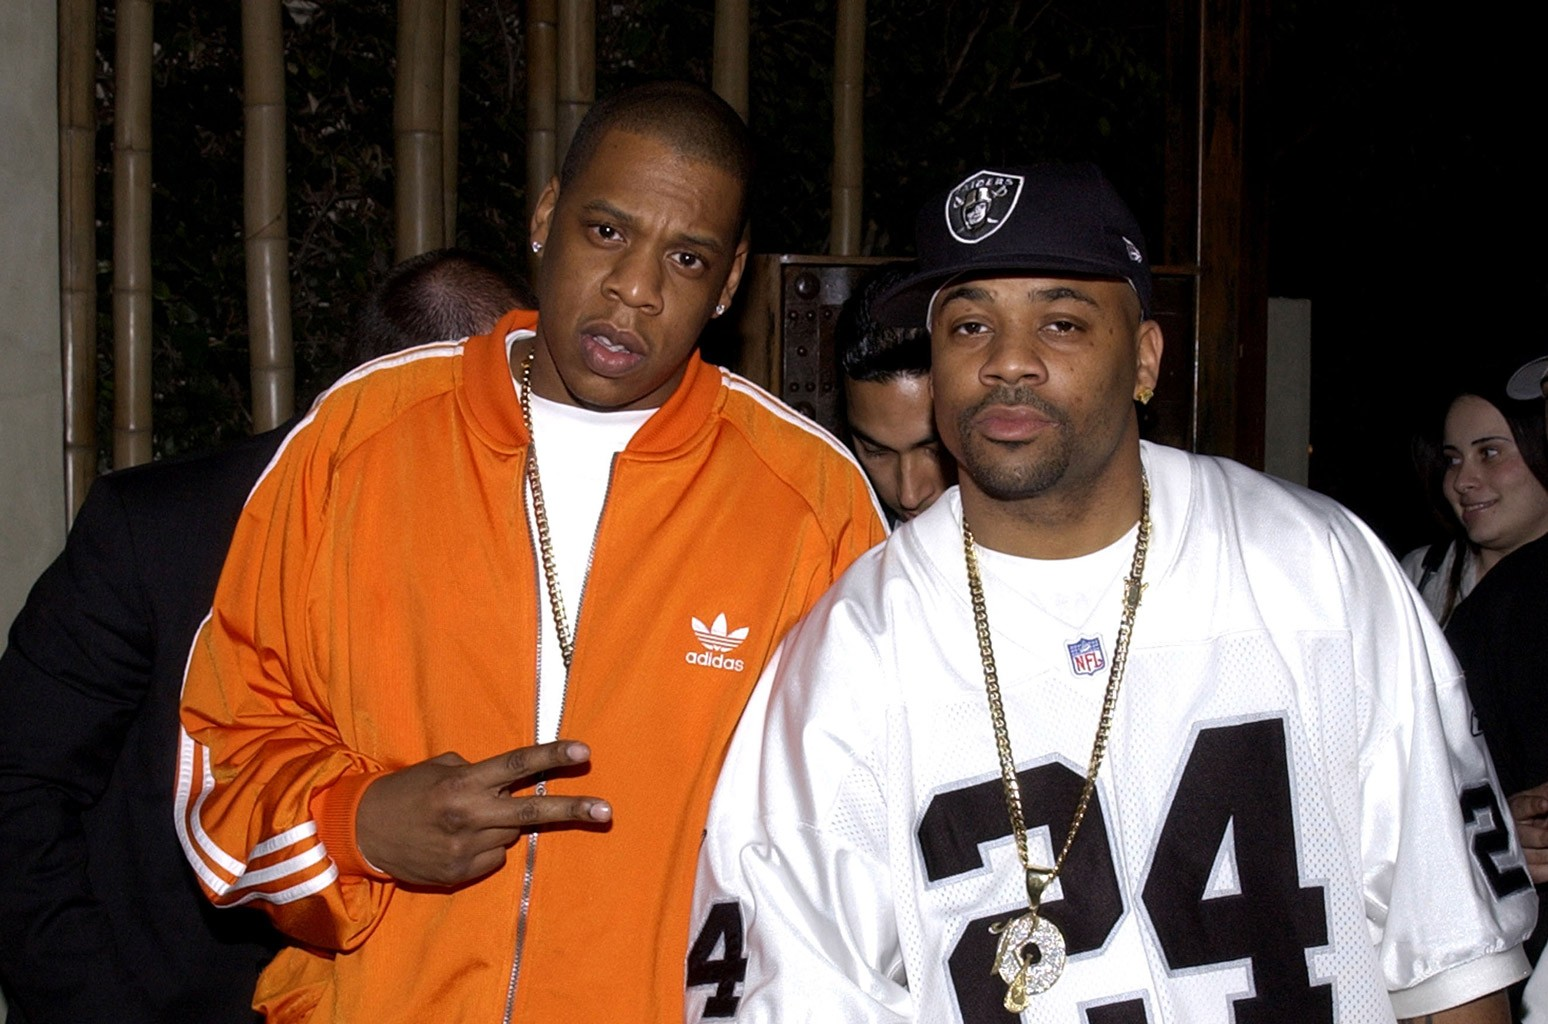 Jay-Z and Damon Dash